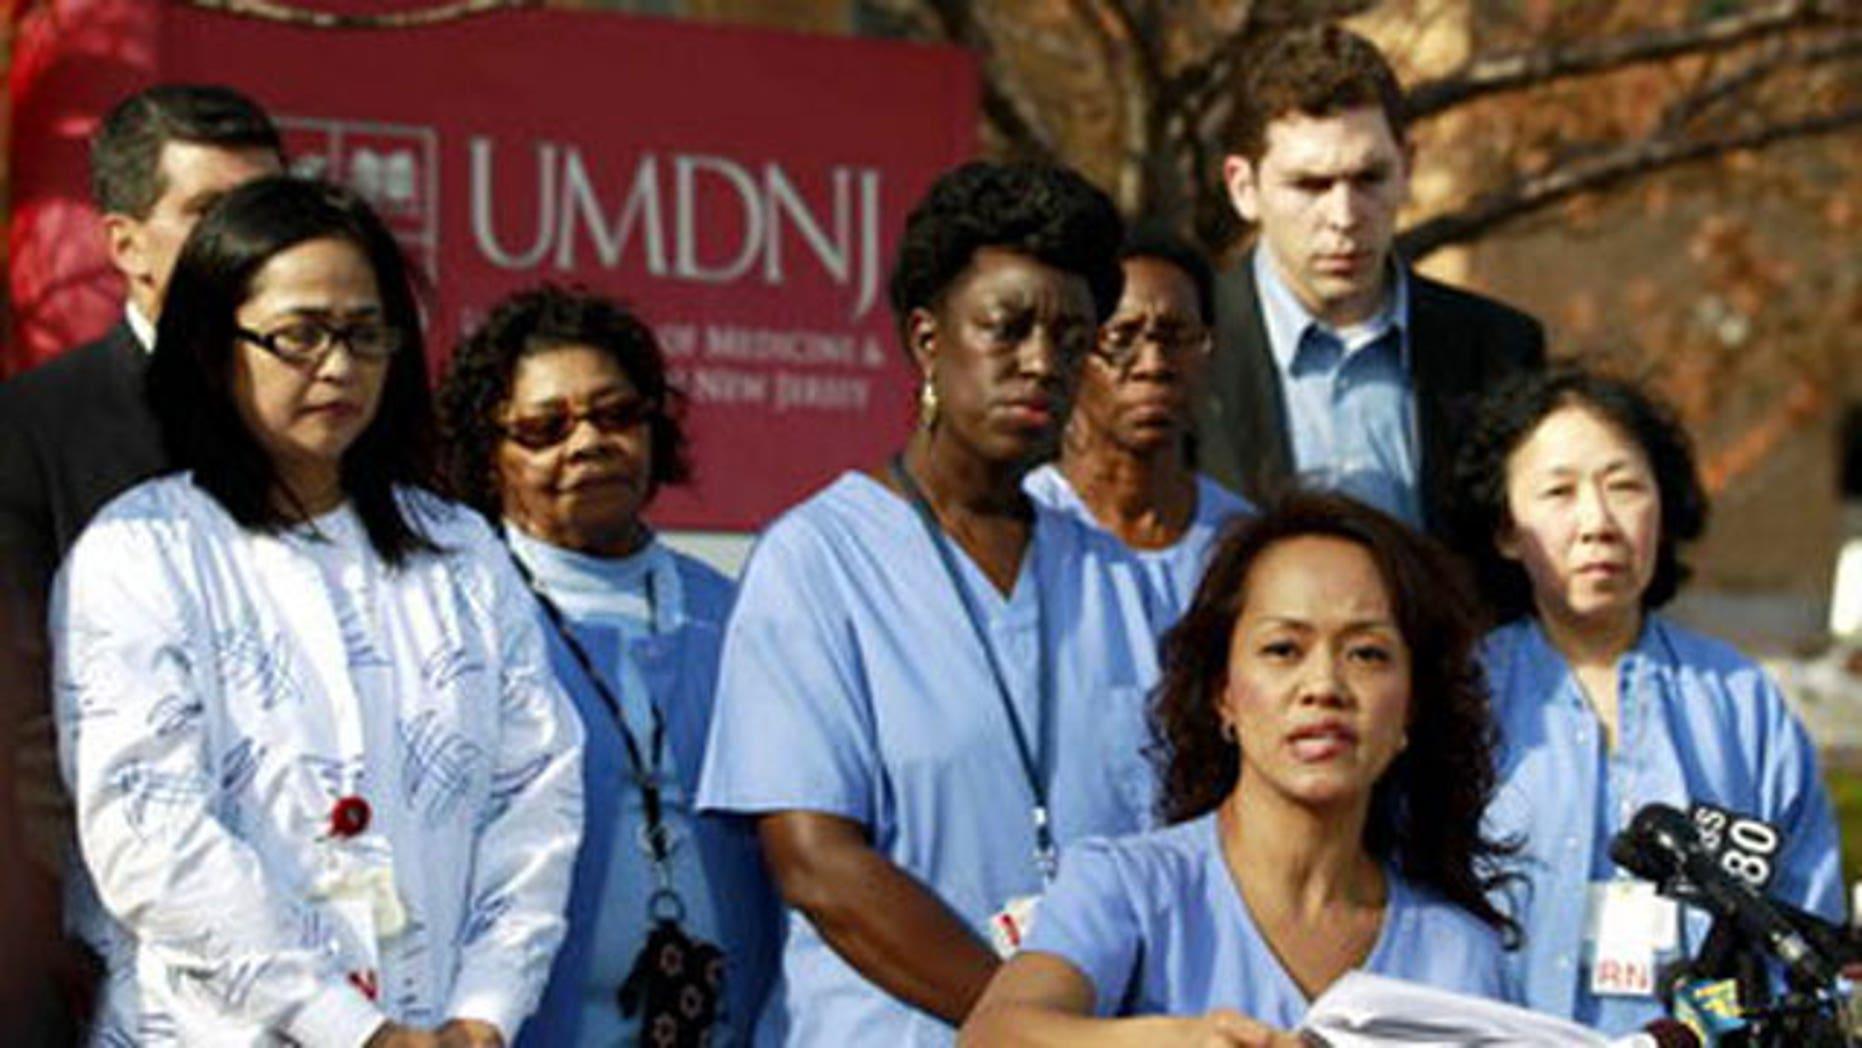 November 14, 2011: Fe Esperanza Racpan Vinoya, bottom, a registered nurse at the University of Medicine and Dentistry of New Jersey, talks during a news conference in Newark, N.J.